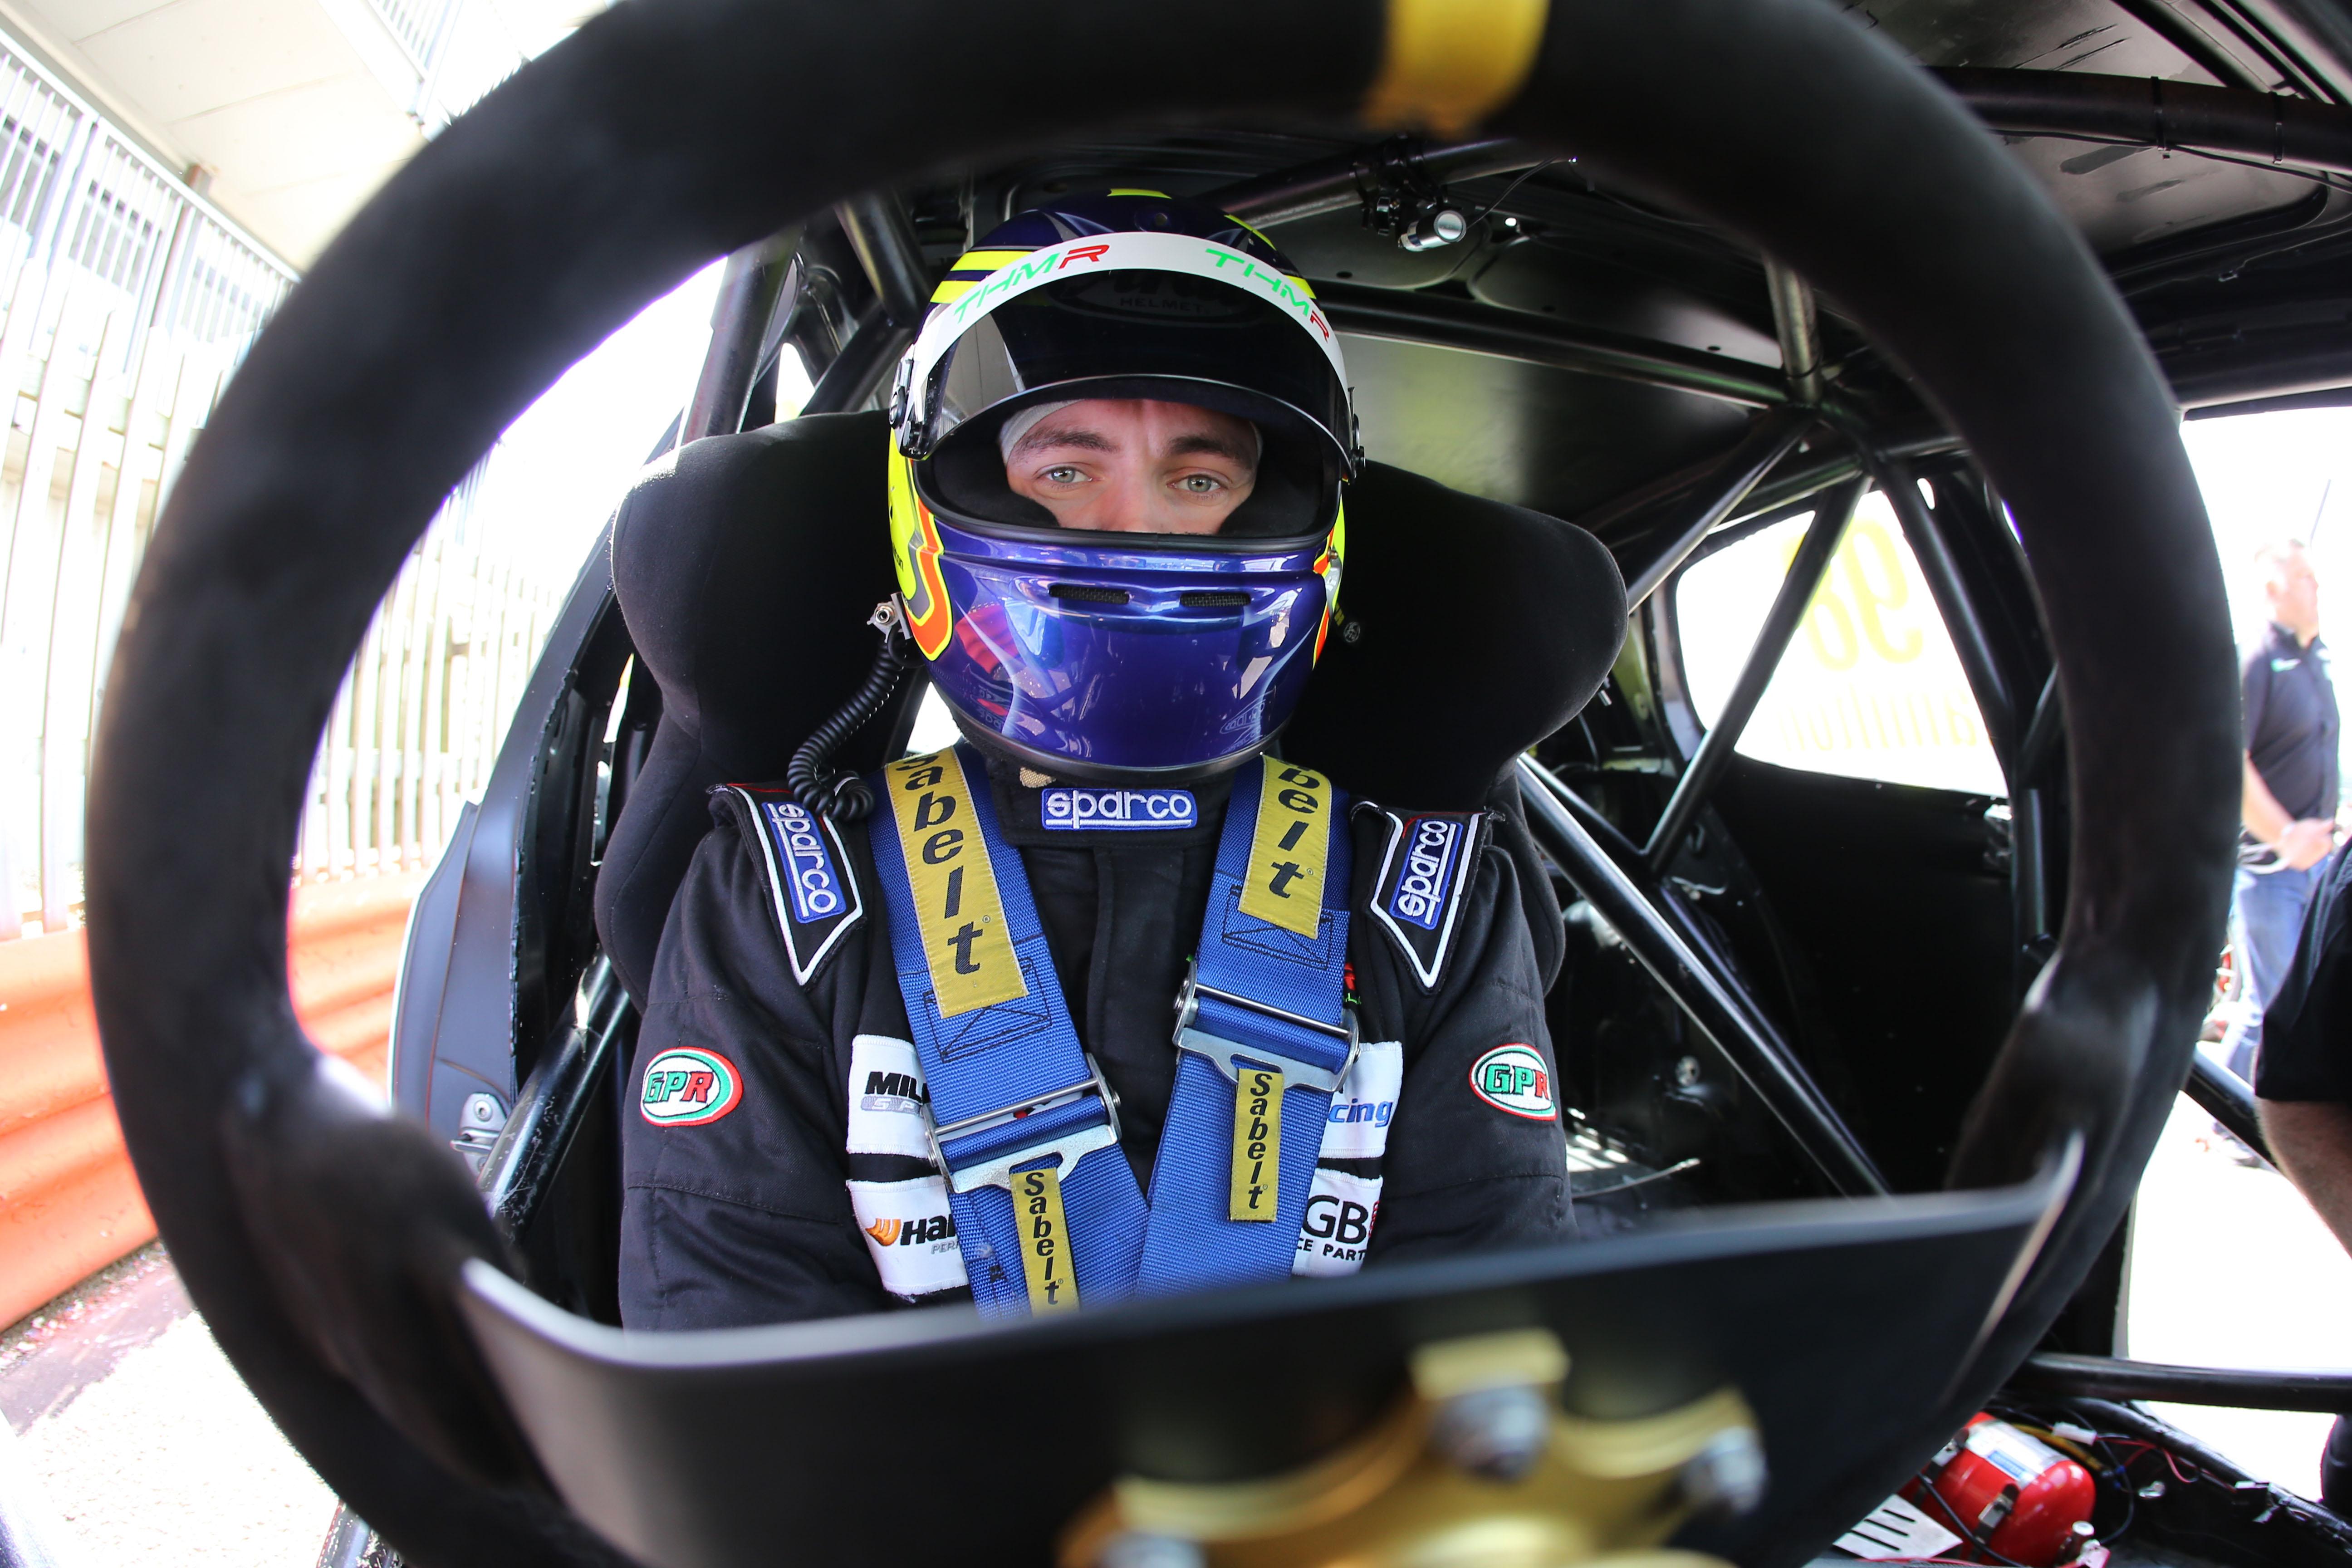 Silverstone-064.jpg